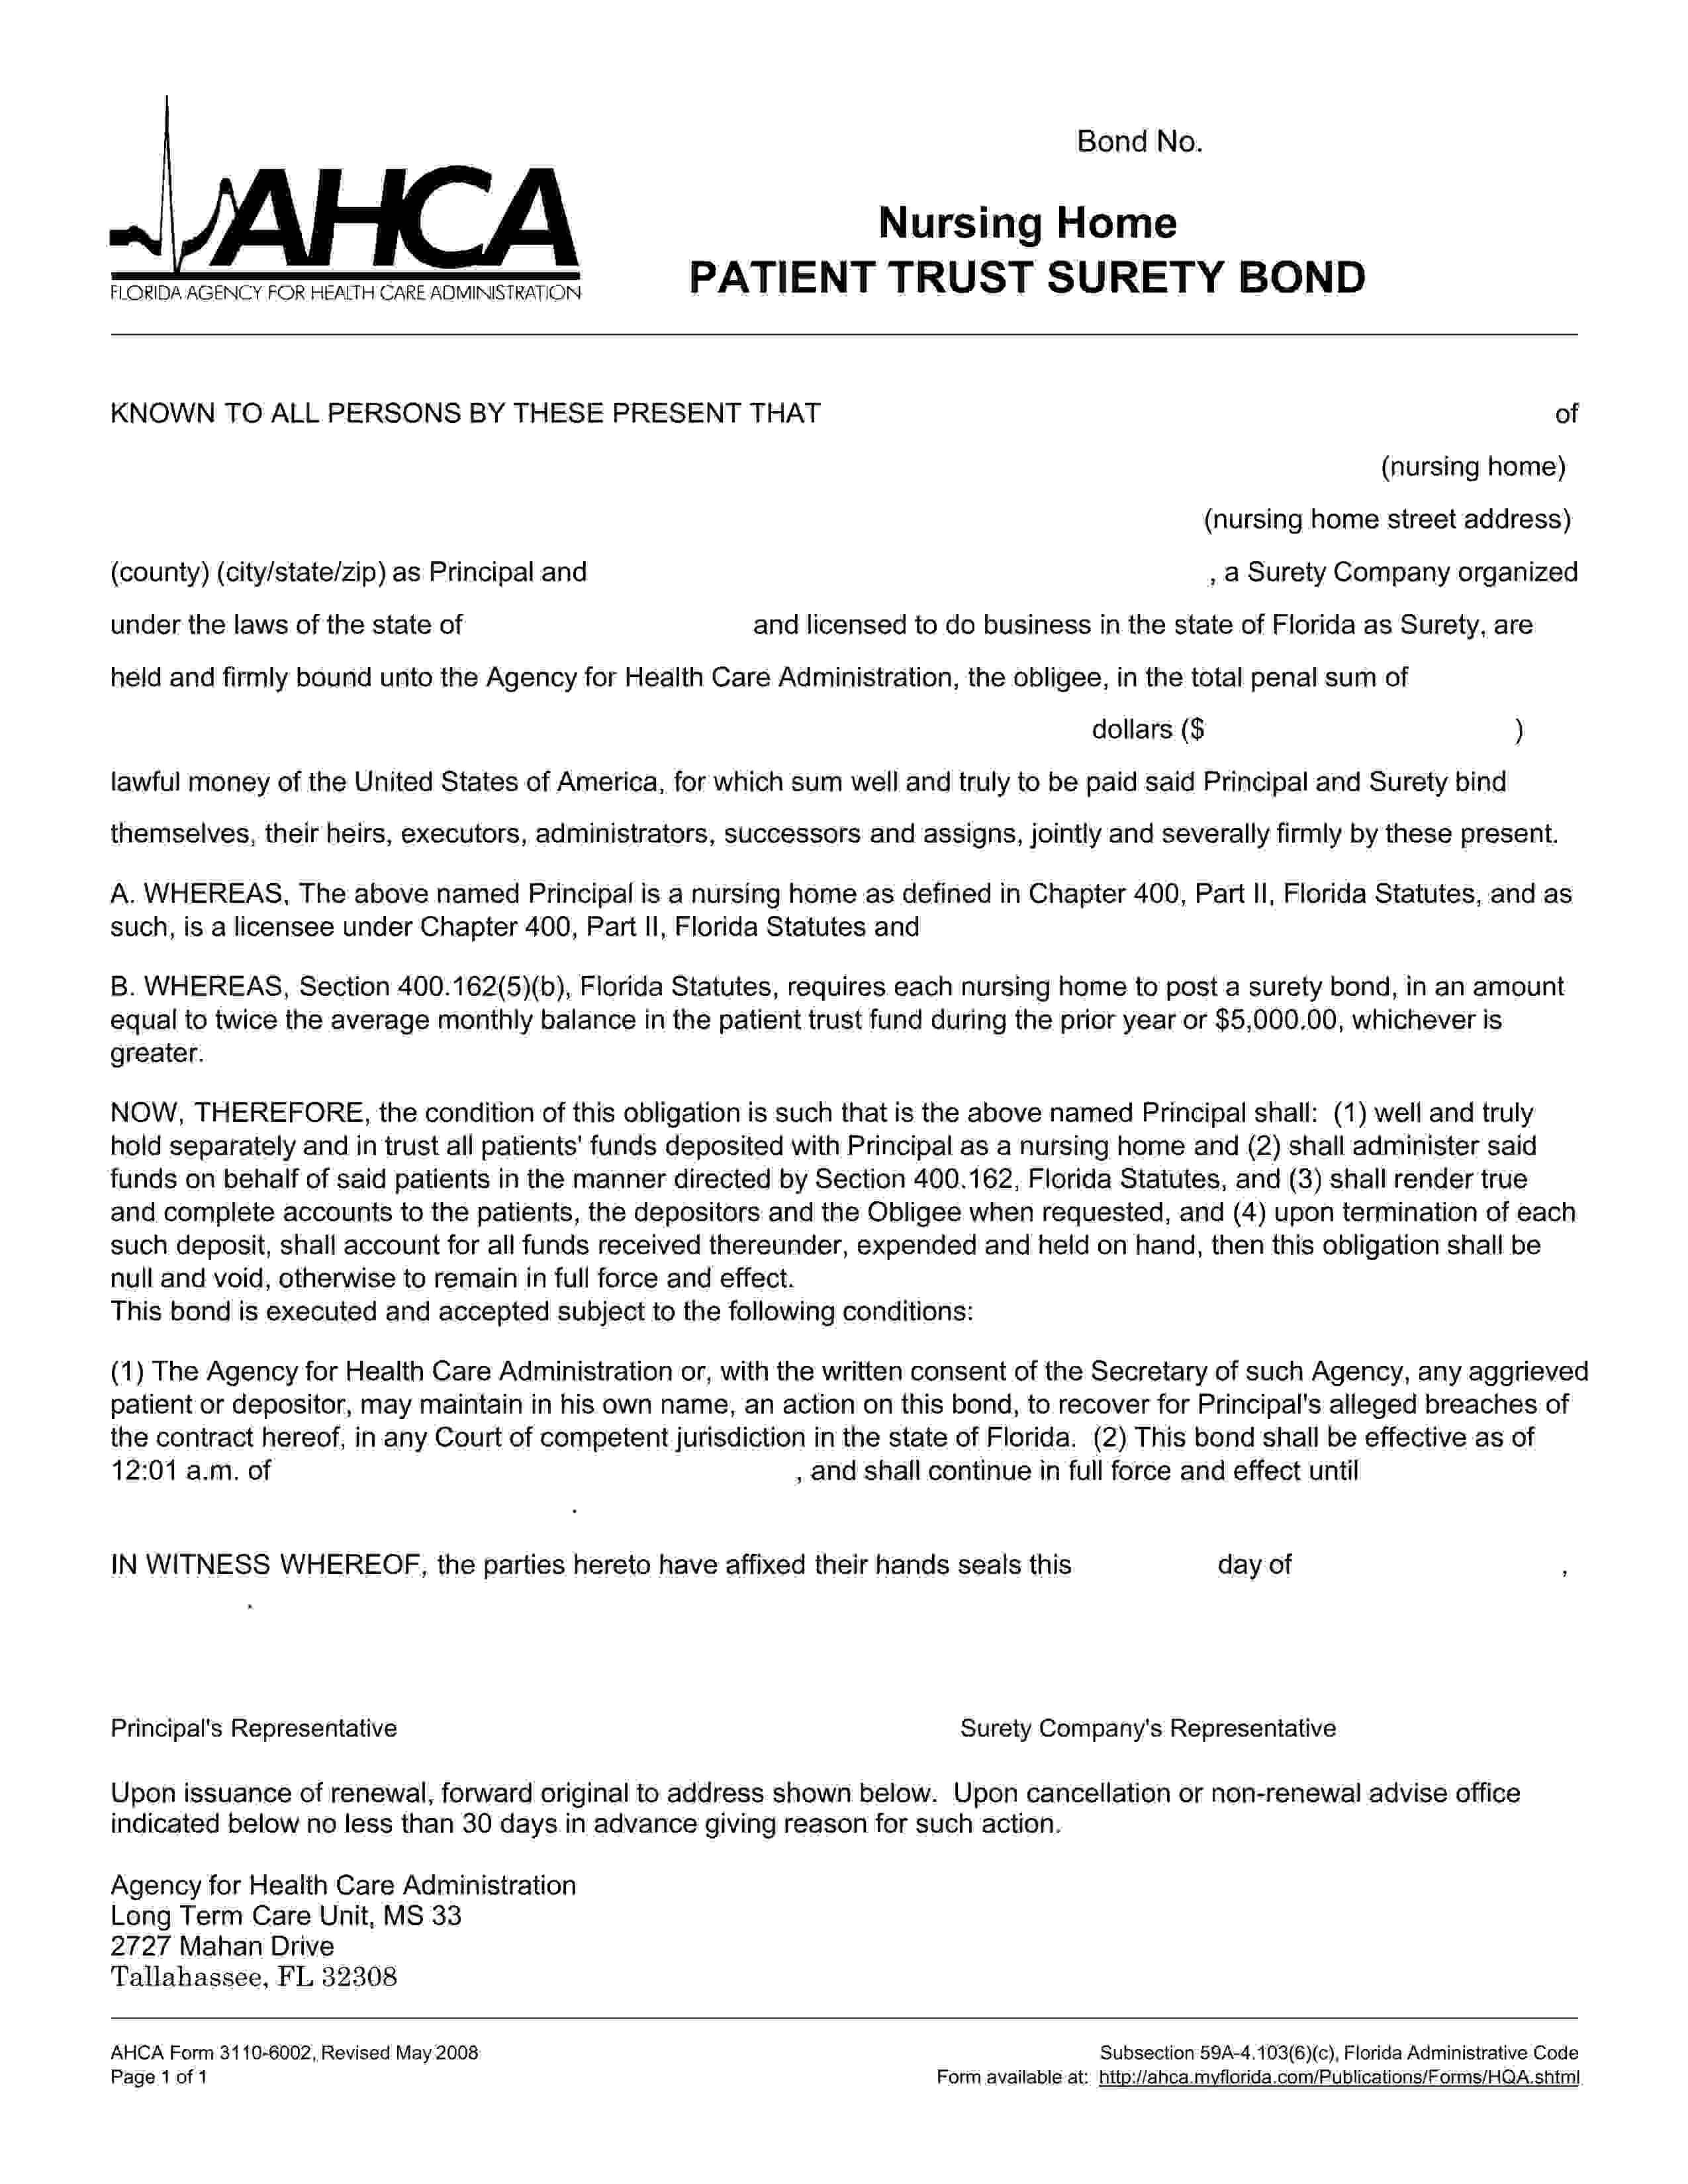 Florida Agency For Health Care Administration Nursing Home Patient Trust Bond sample image